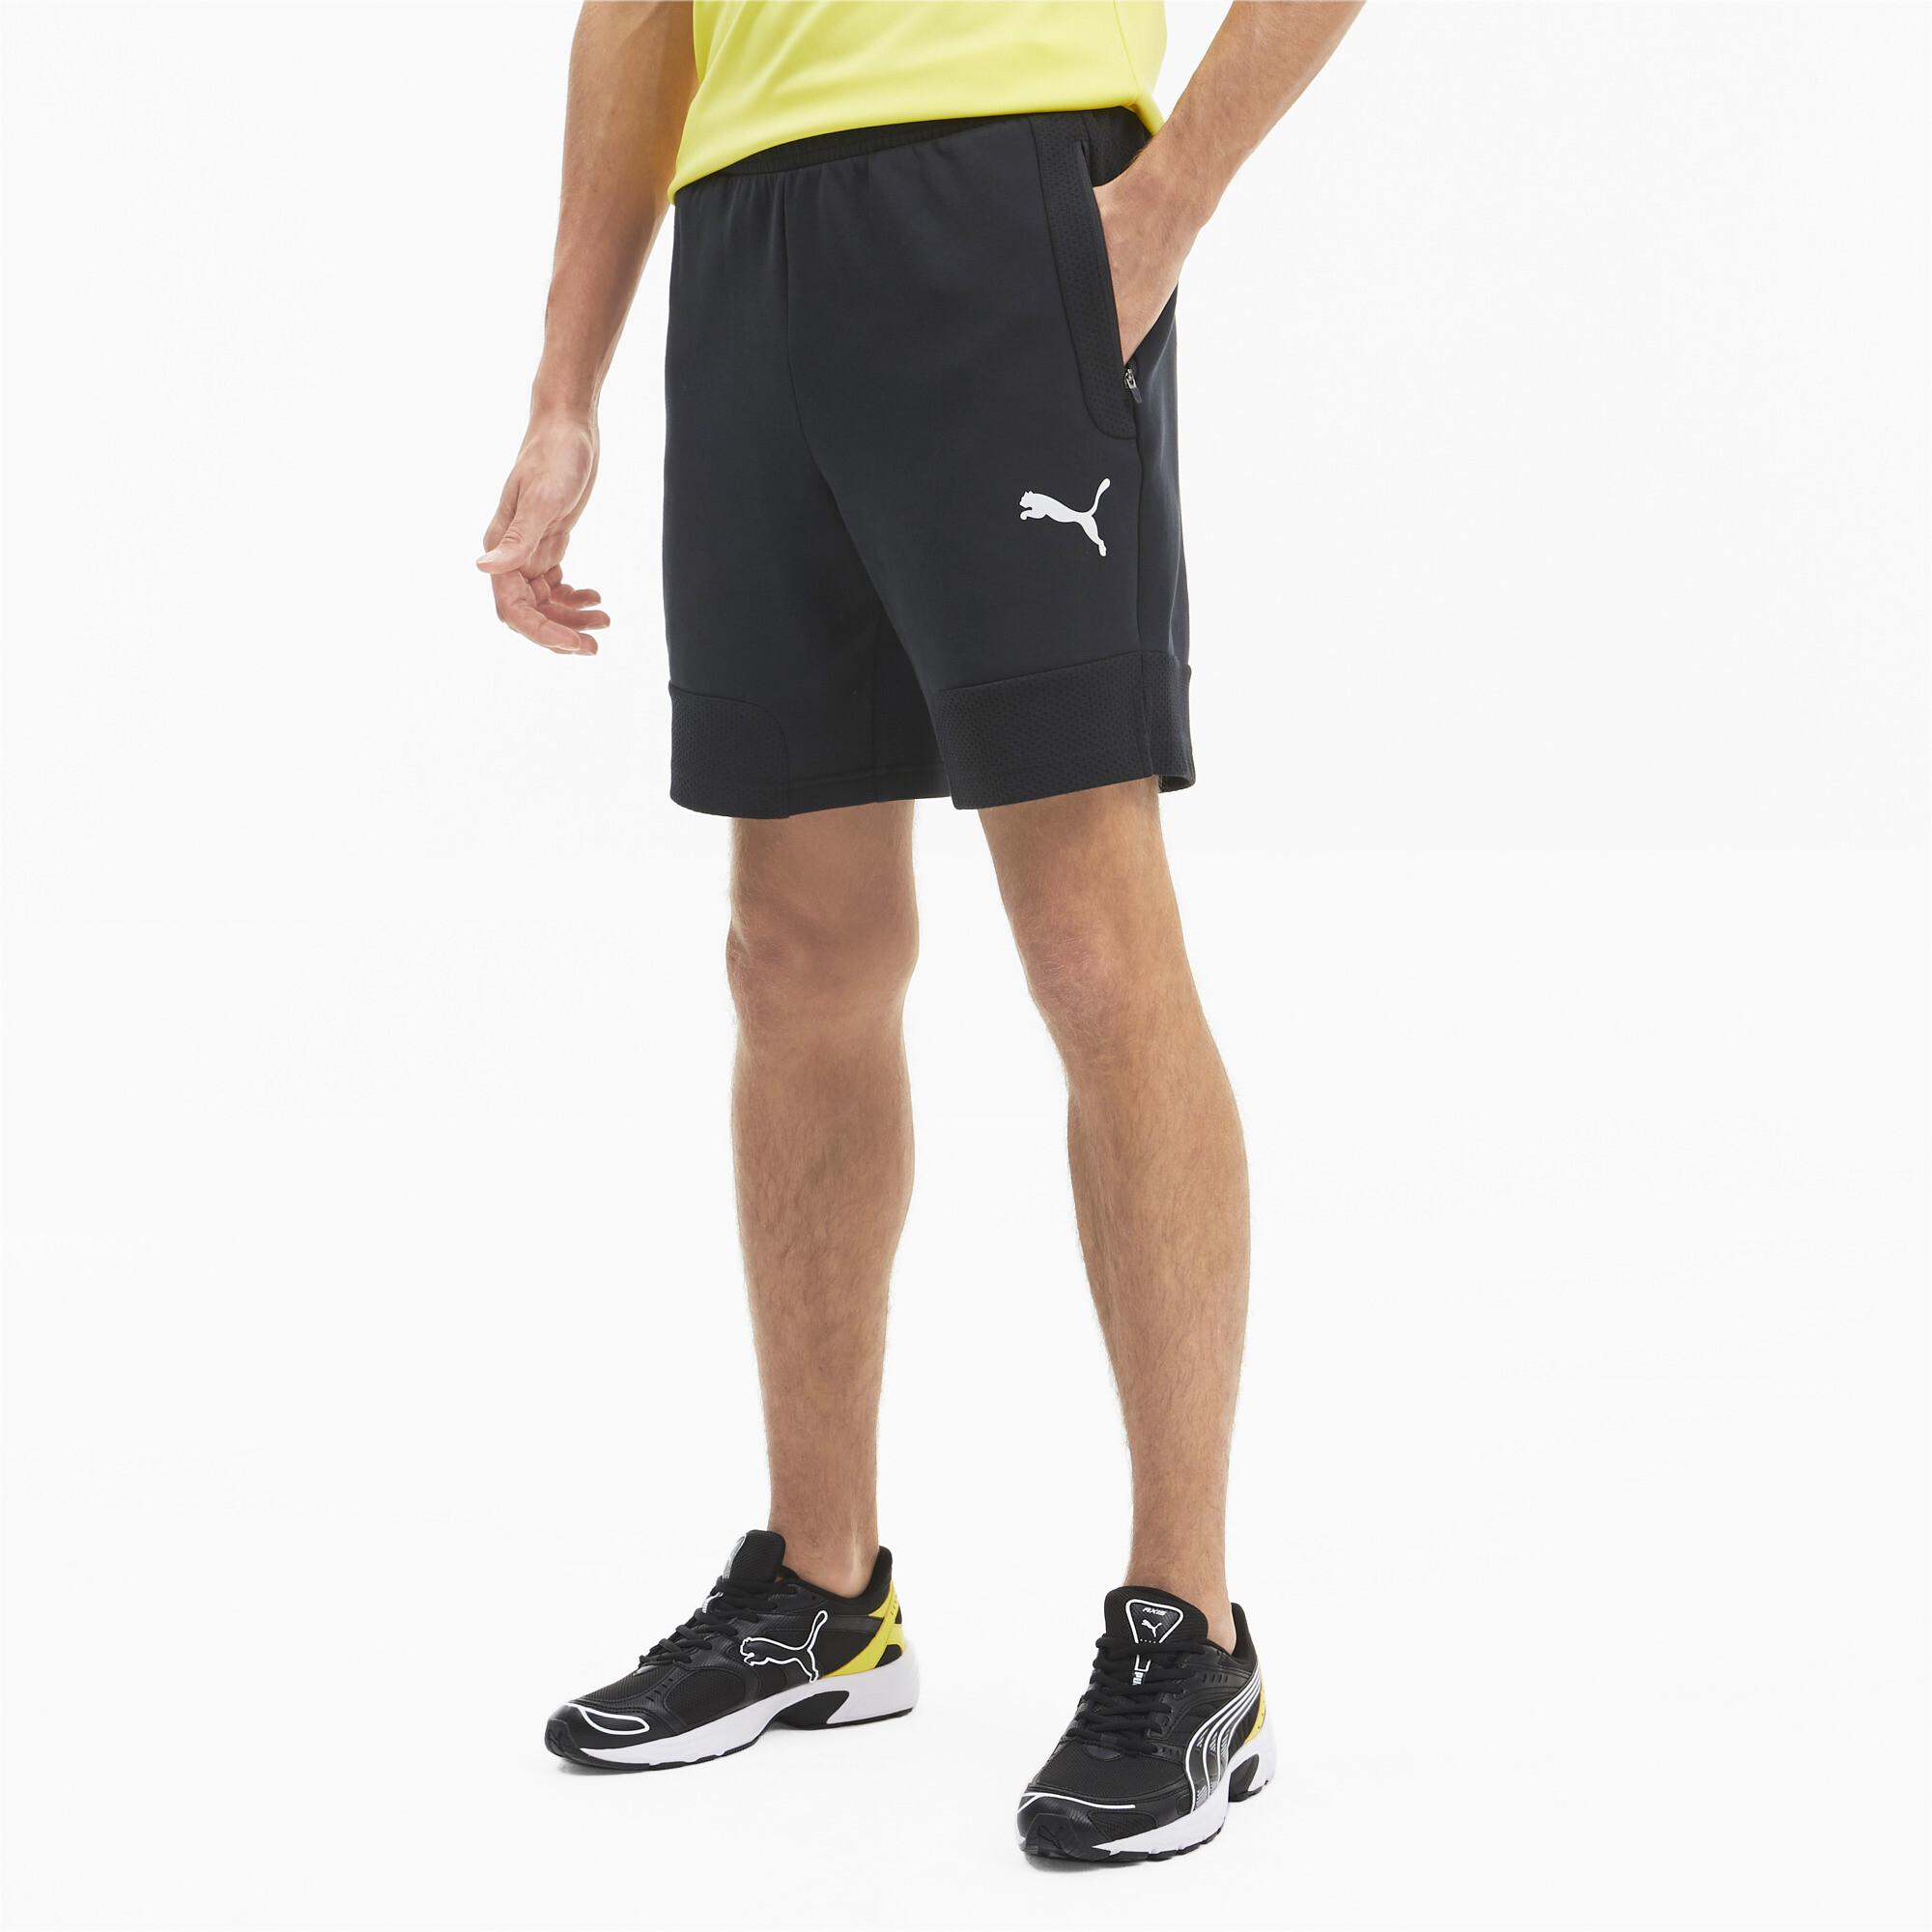 PUMA-Evostripe-Men-039-s-Shorts-Men-Knitted-Shorts-Basics thumbnail 4